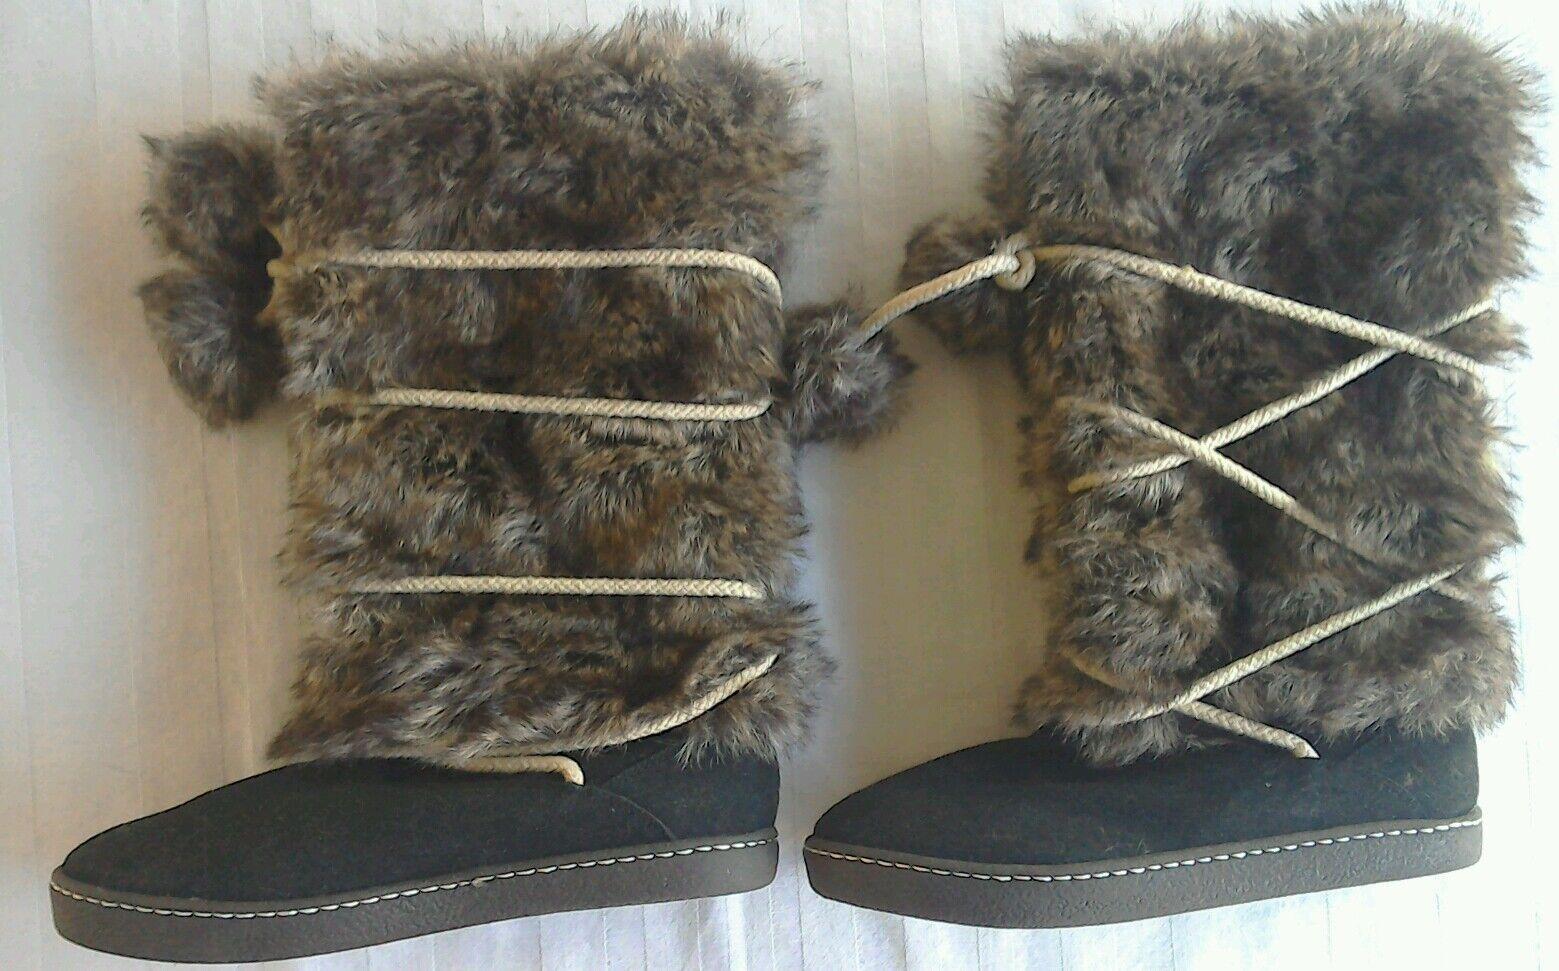 Trendy boots fur brown size UK 5.5 Europe 38.5 Australia 6.5